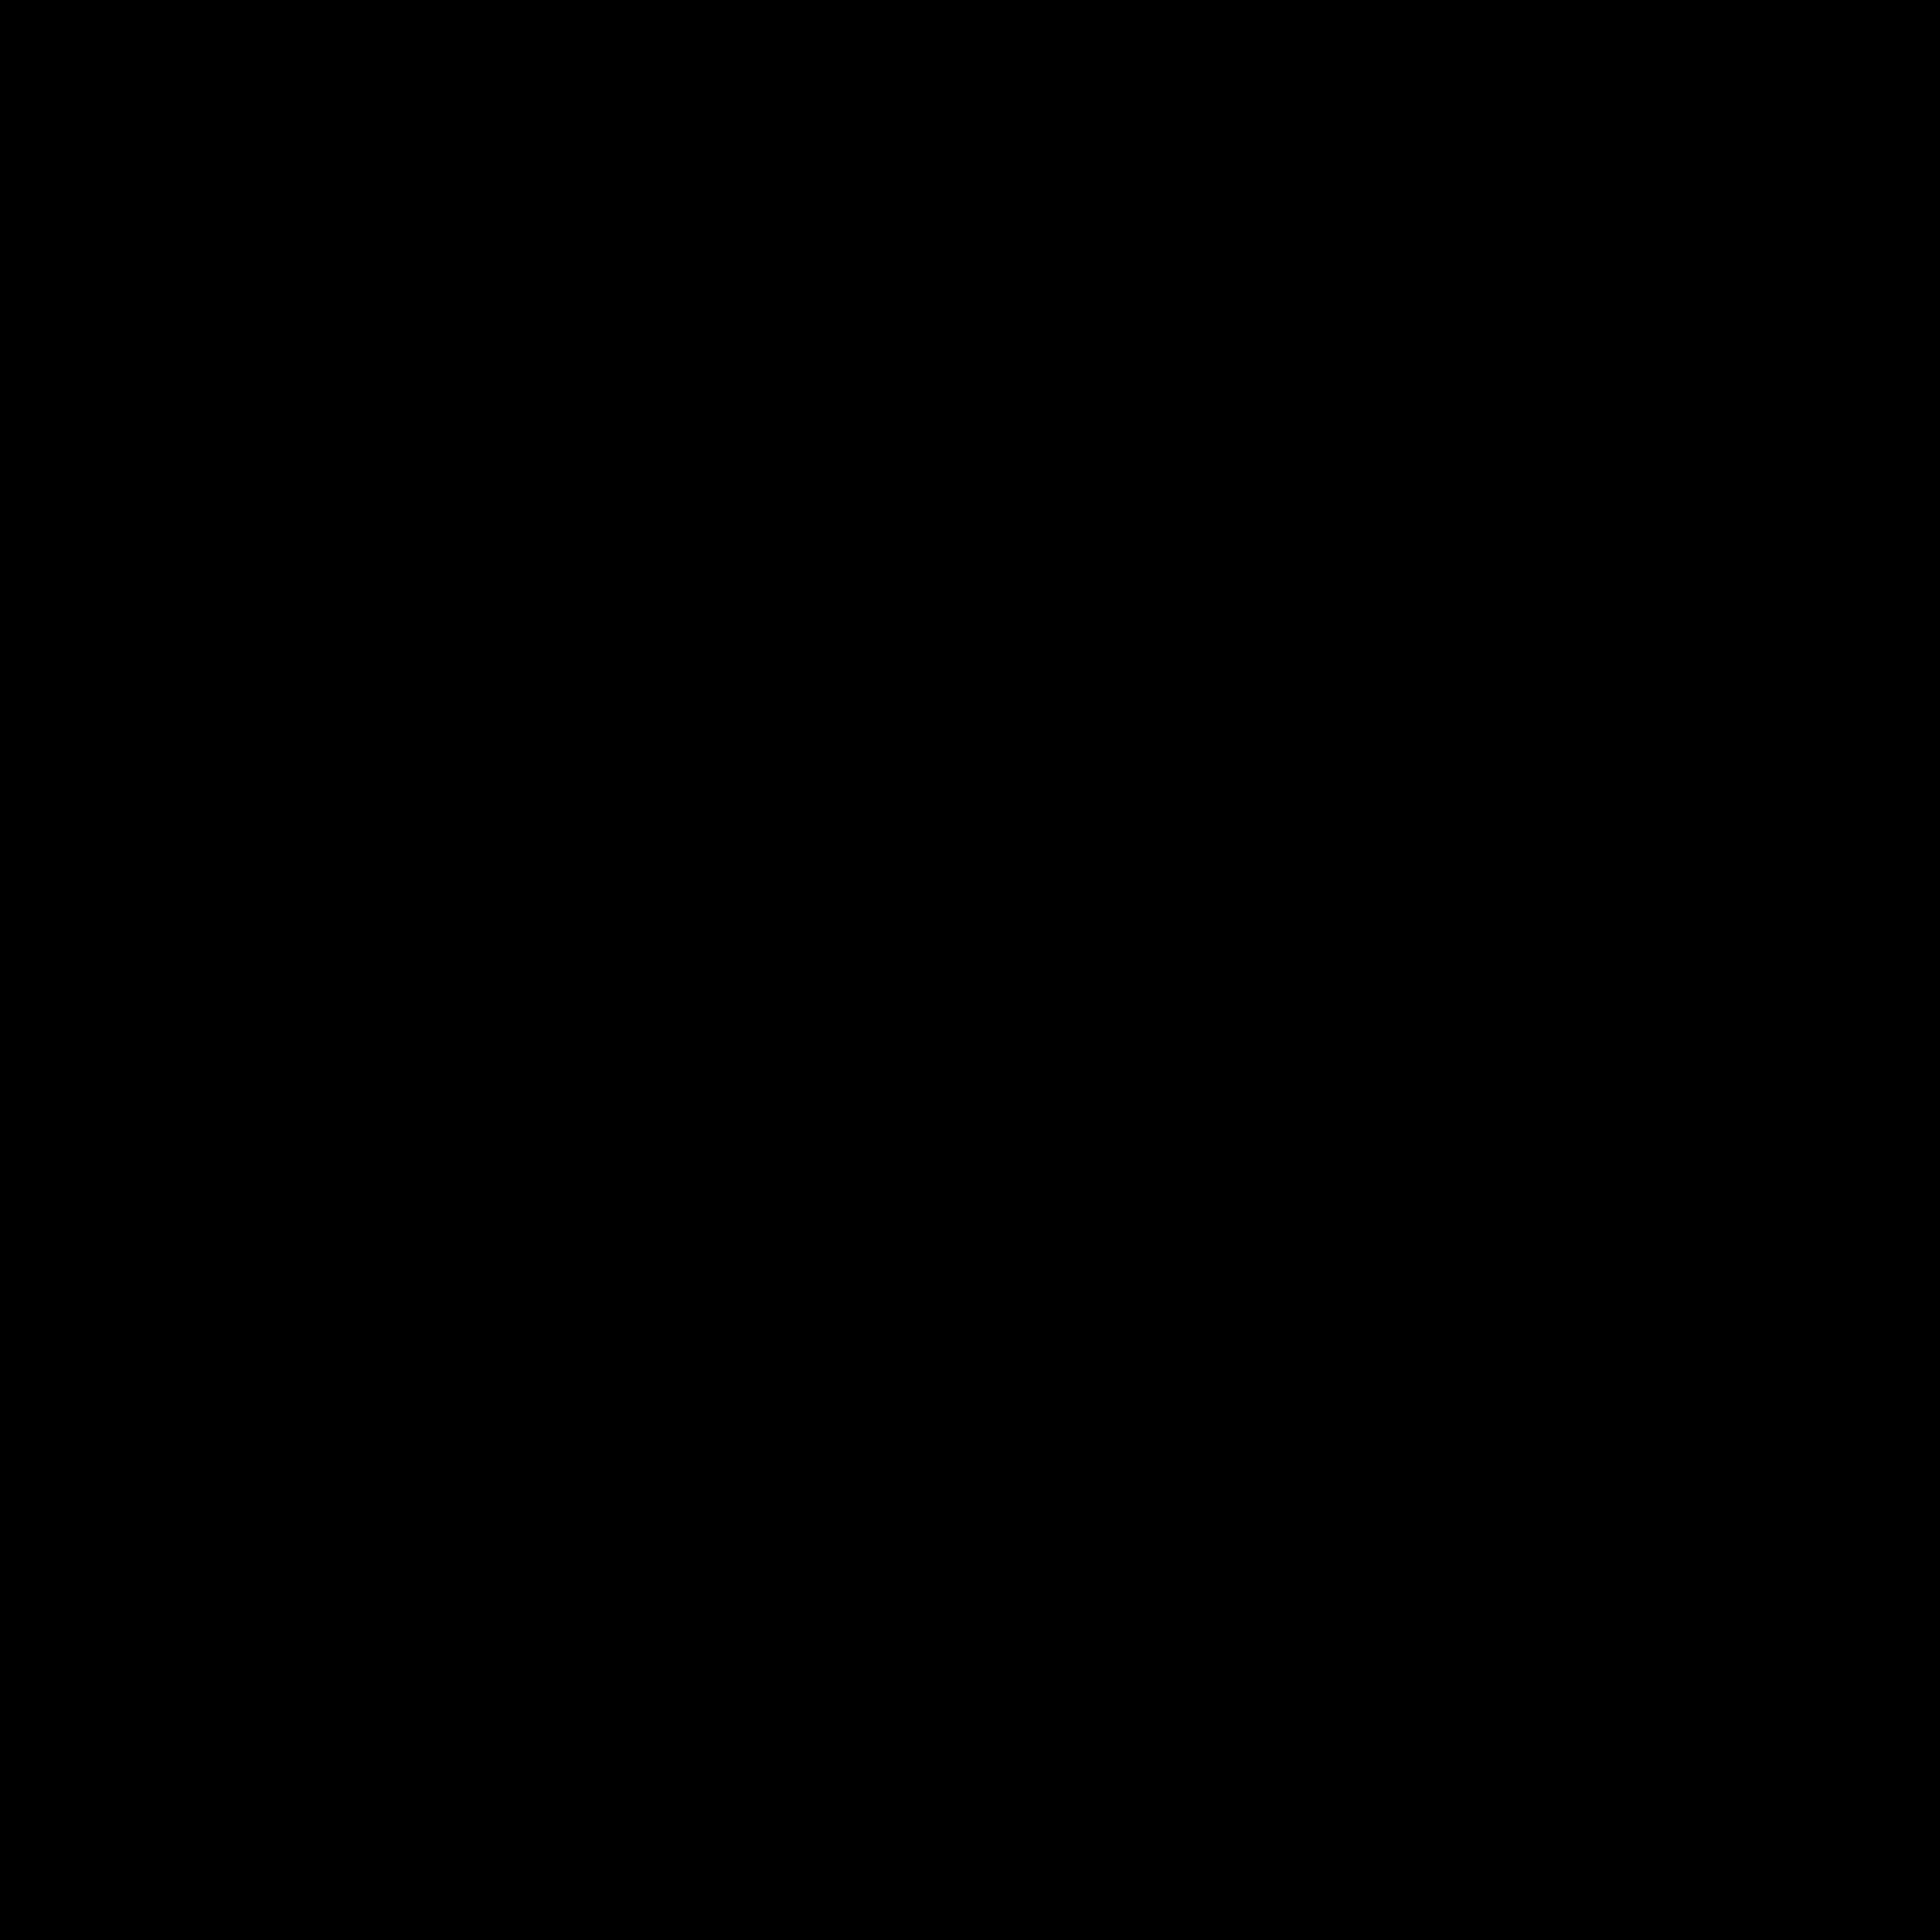 meo logo 0 - MEO Logo